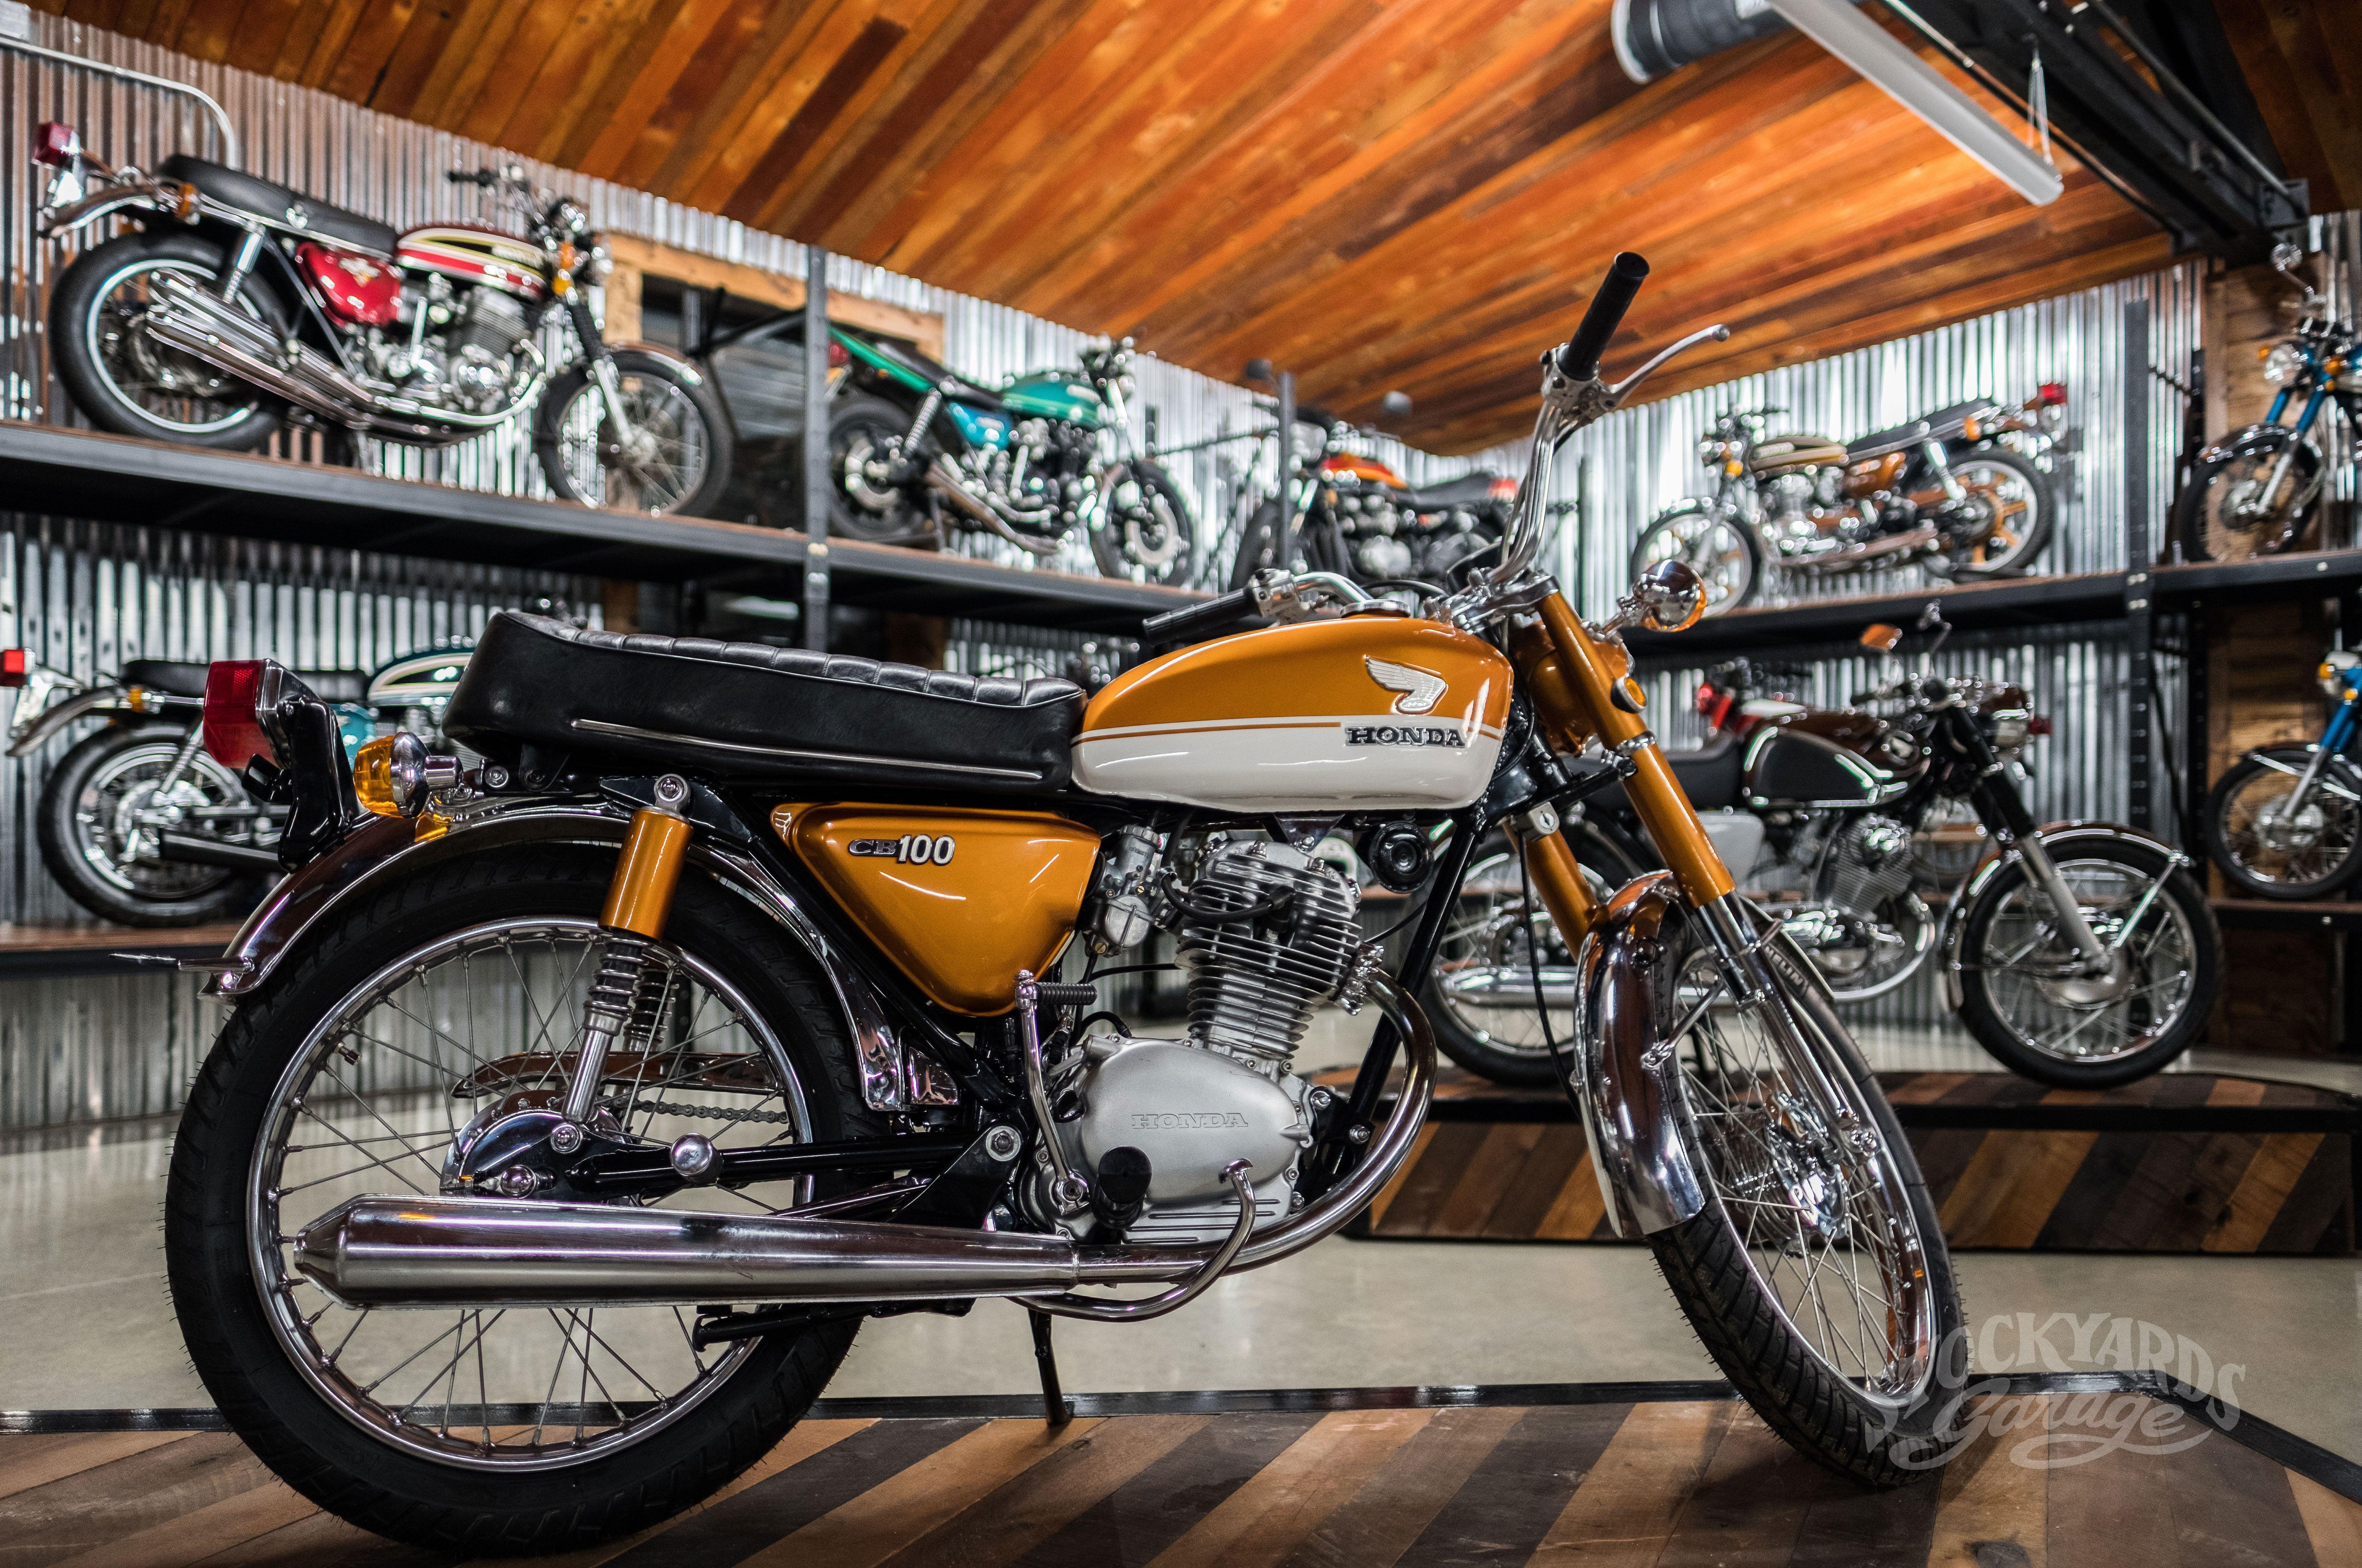 1971 Honda Cb100 At Stockyards Garage Honda Cb100 Cb 100 Classic Cb 100